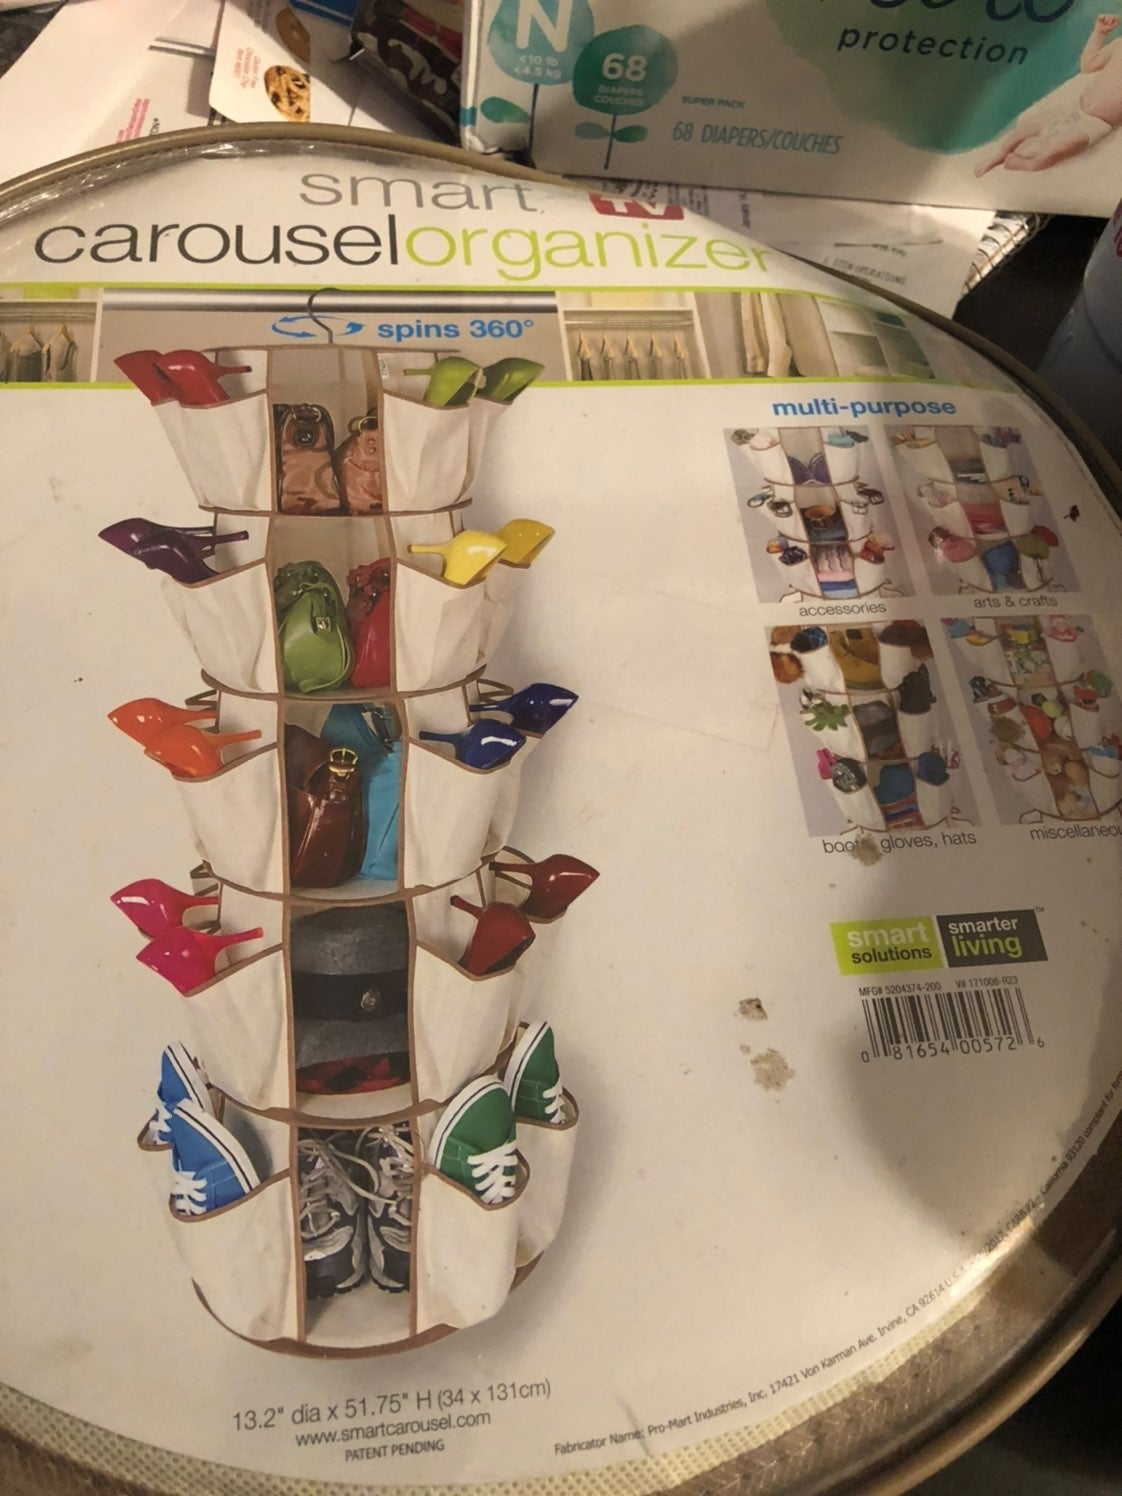 Smart carousel organizer